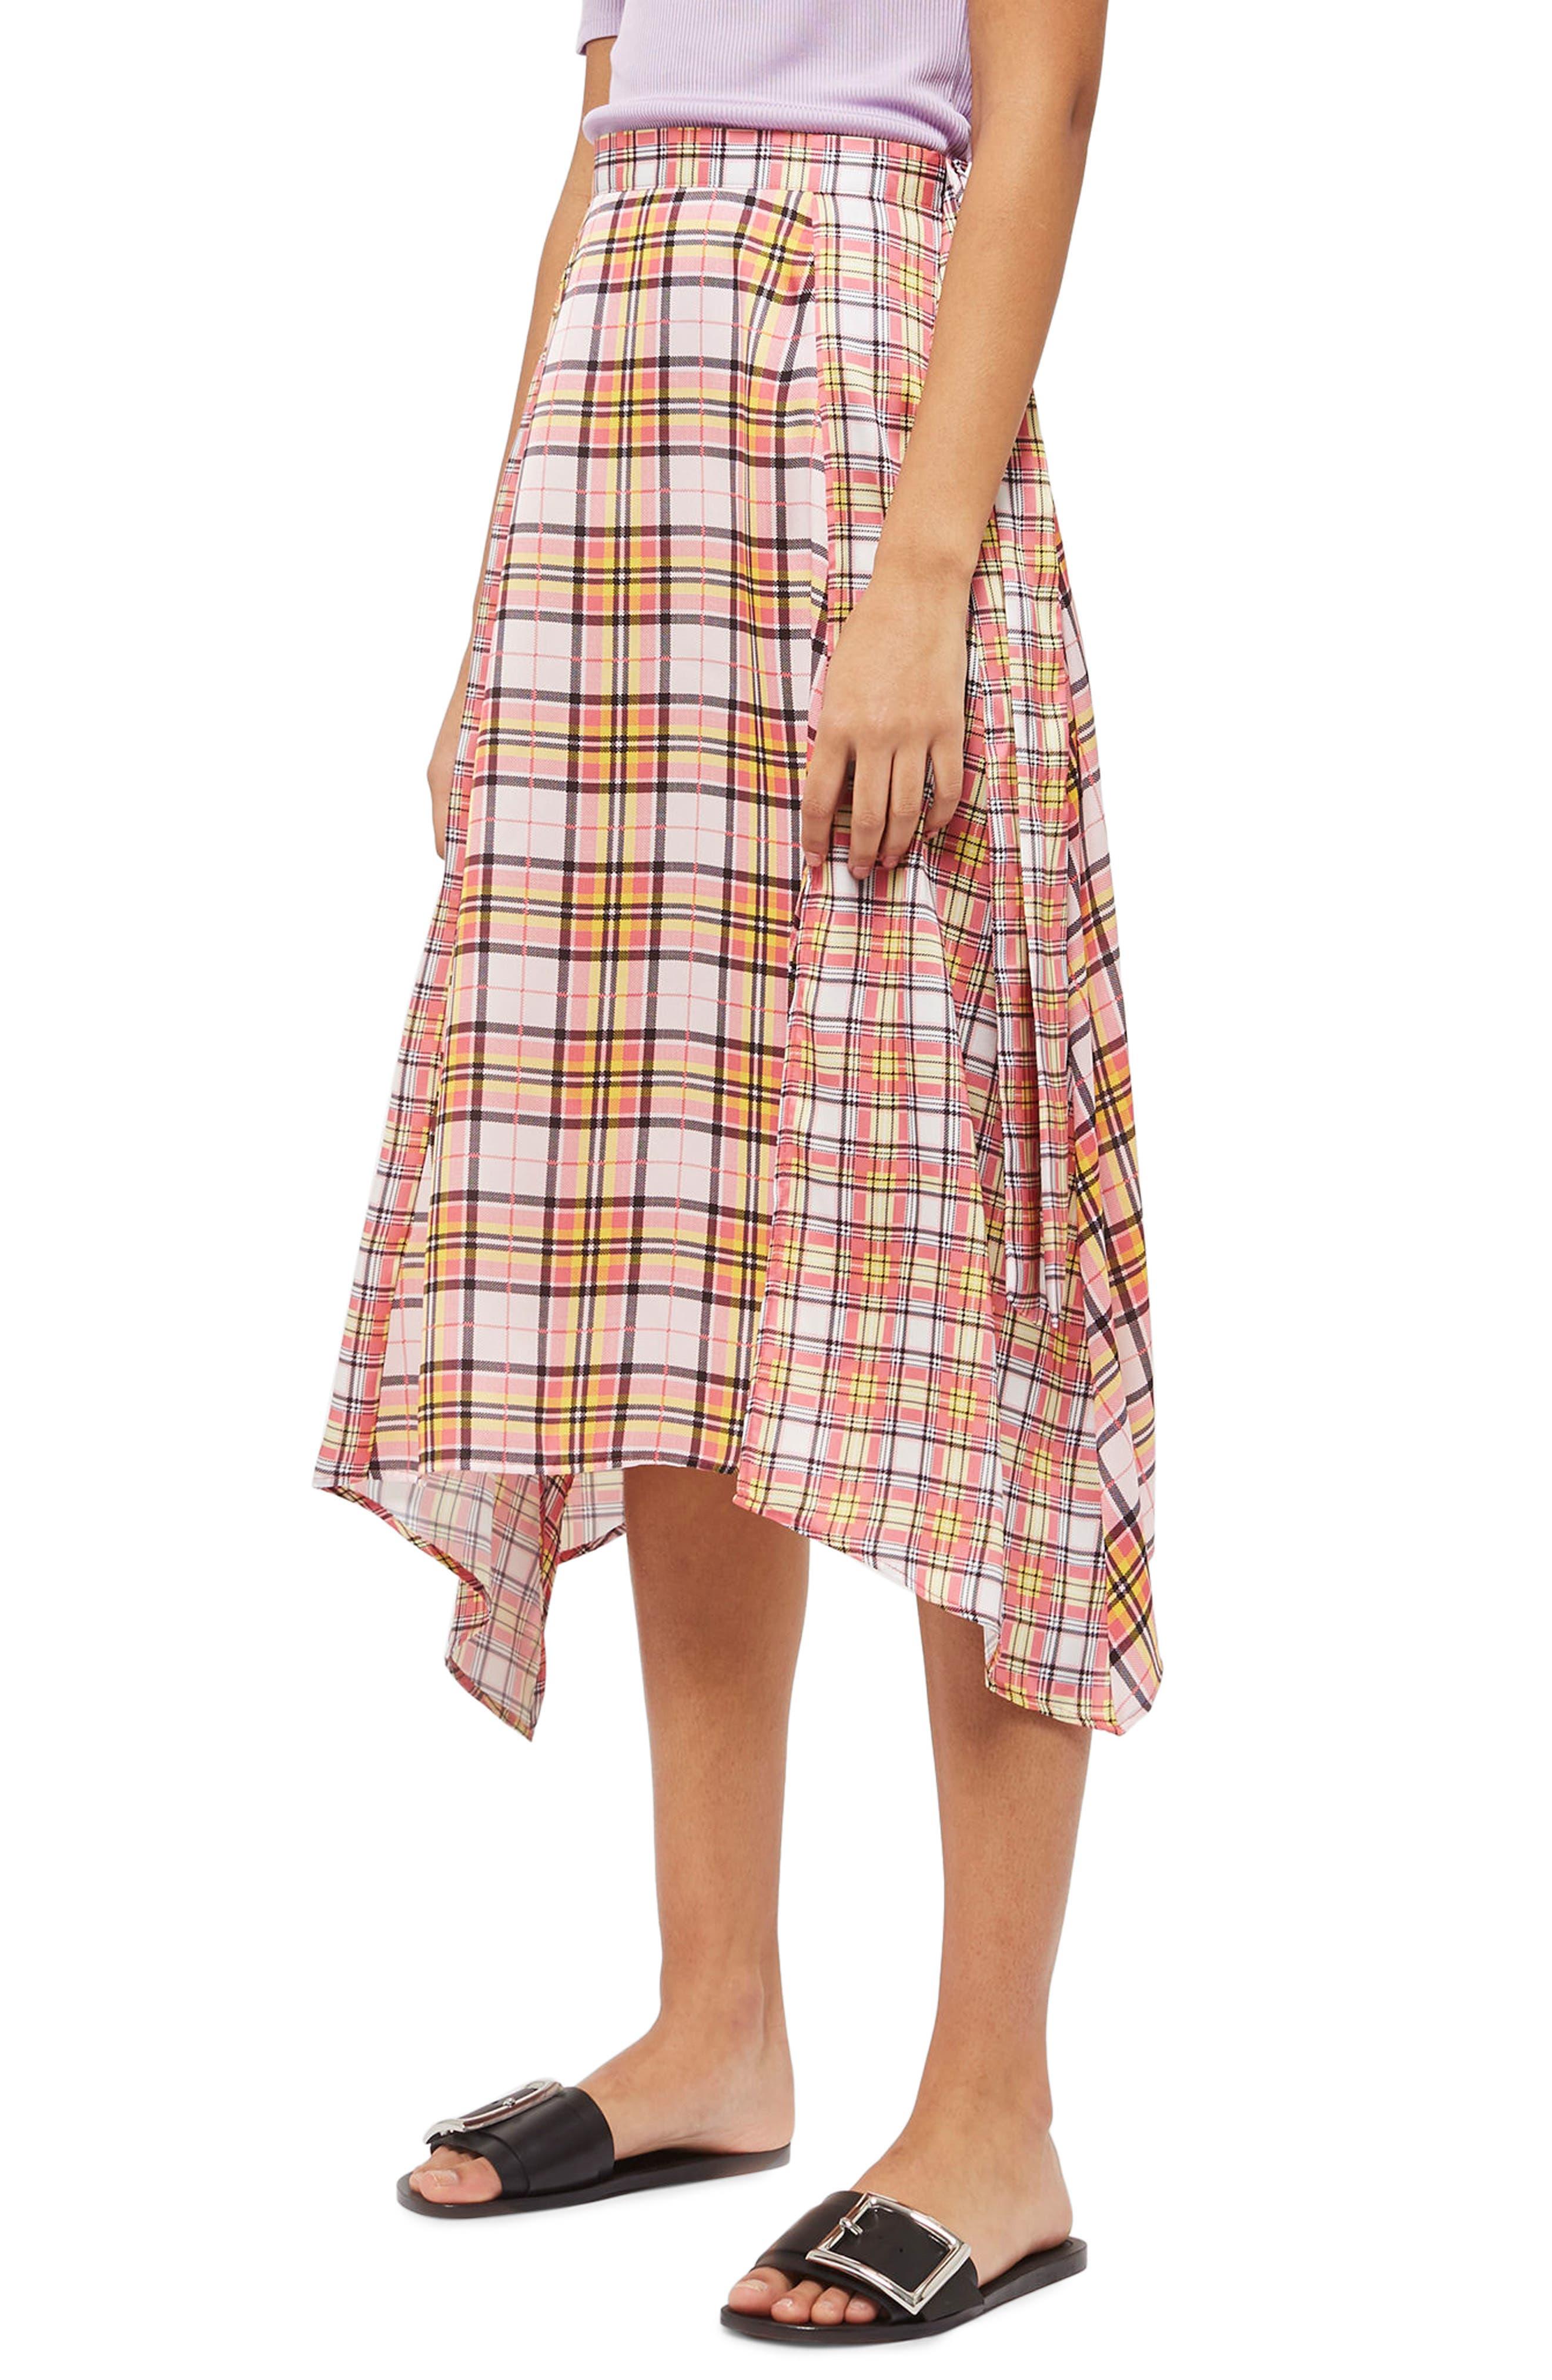 Alternate Image 1 Selected - Topshop Mixed Check Midi Skirt